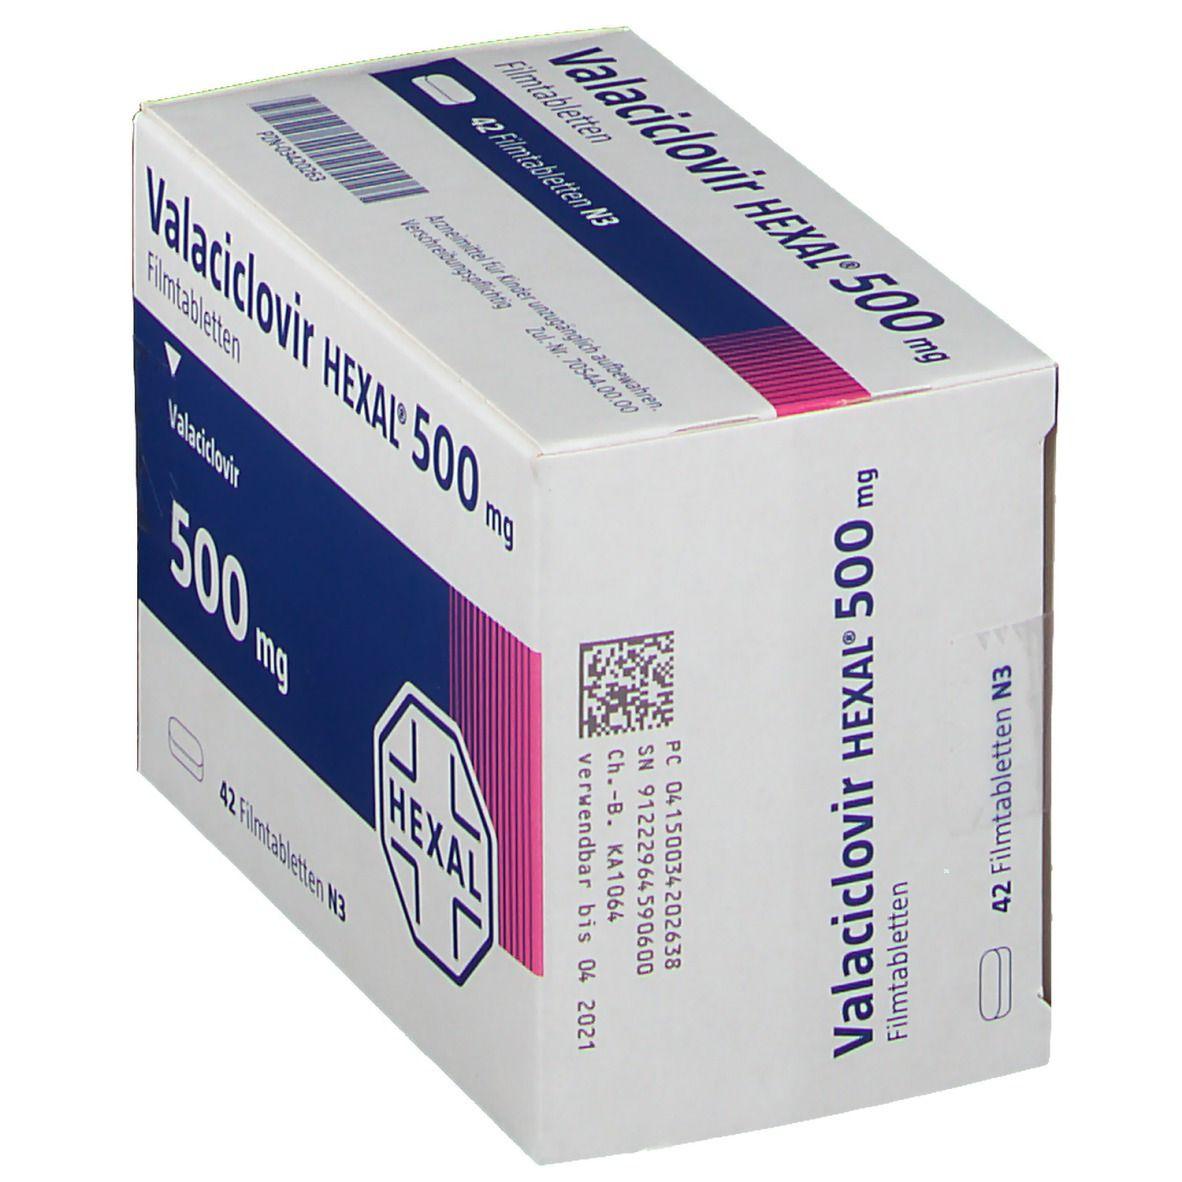 Enfexia 500 mg sefuroksim aksetil nedir